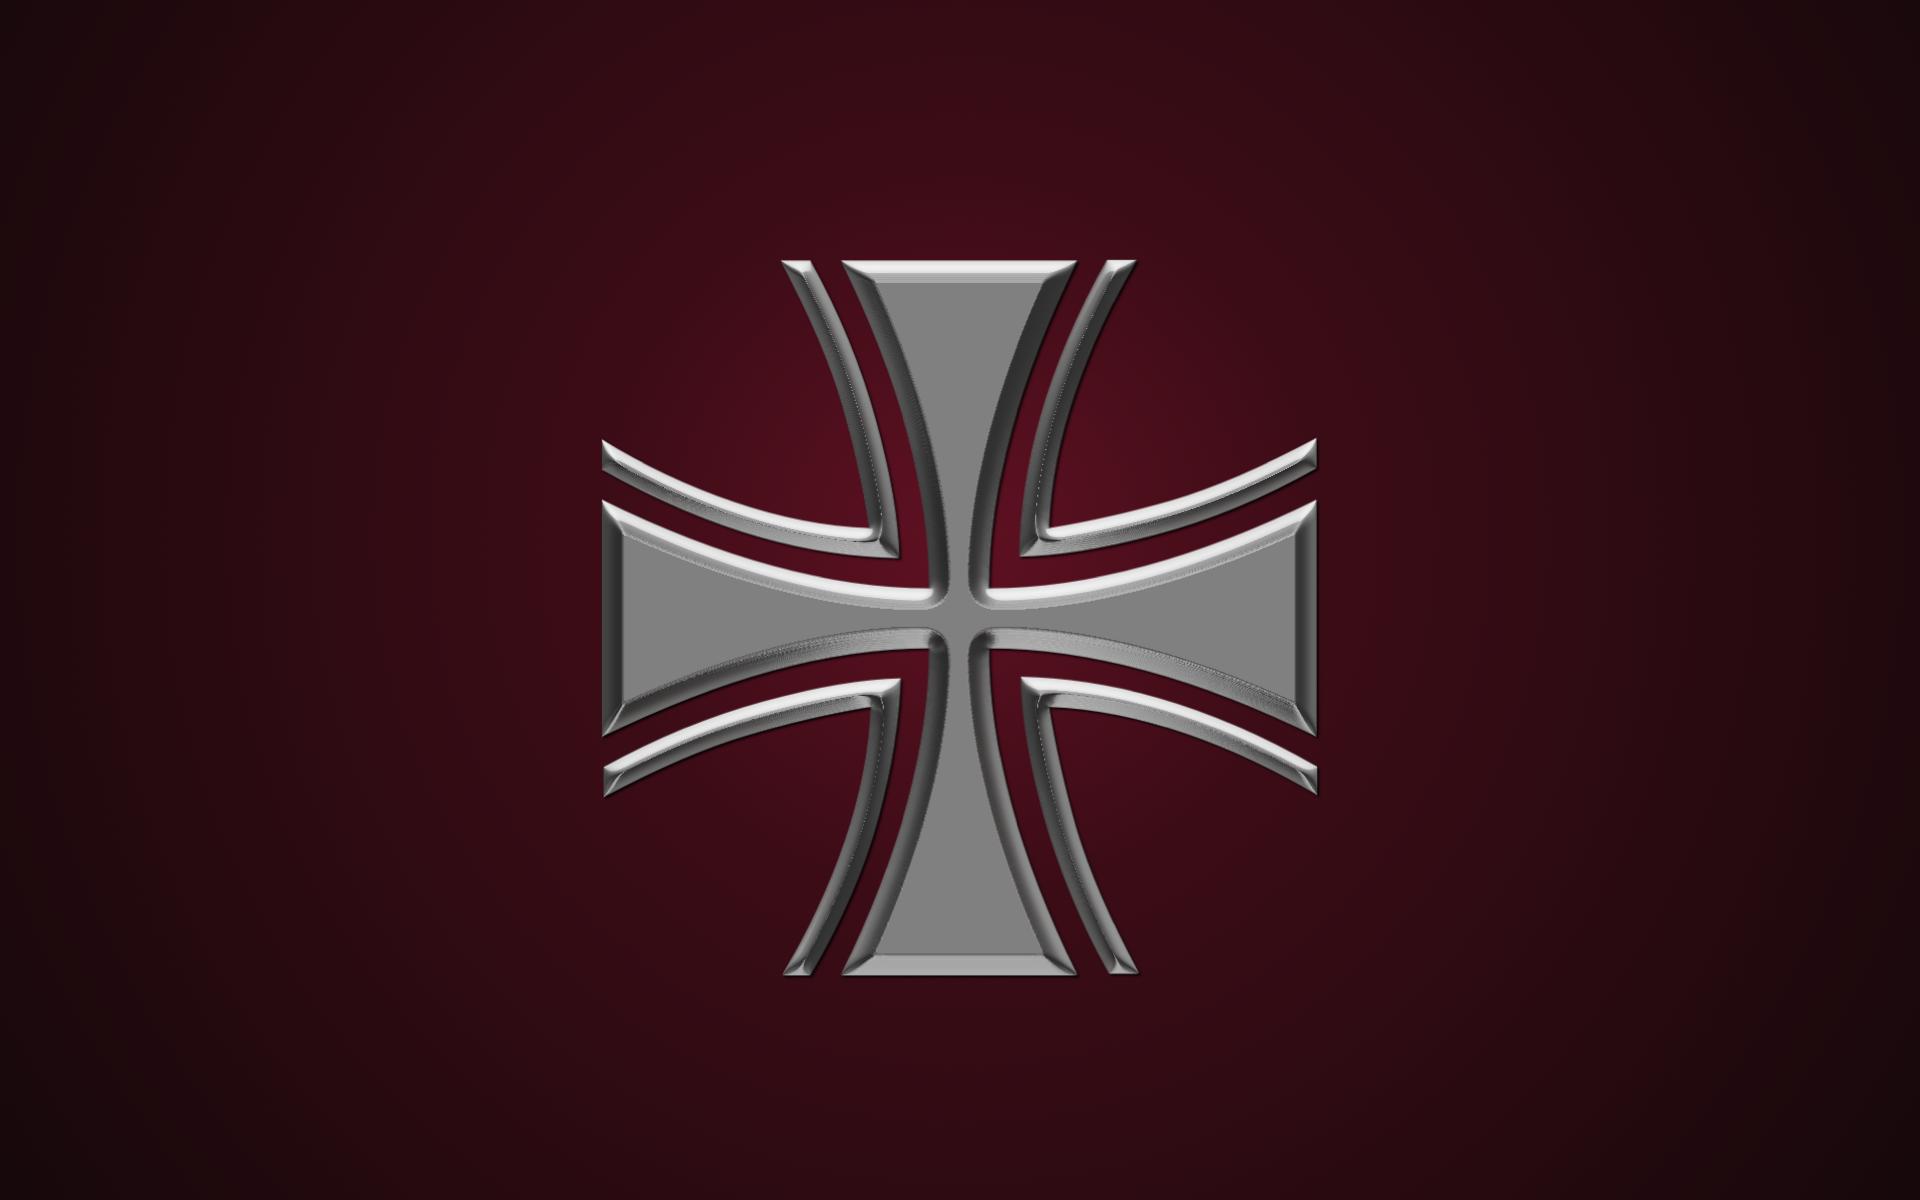 Iron Cross Wallpaper 1920x1200 Iron Cross 1920x1200